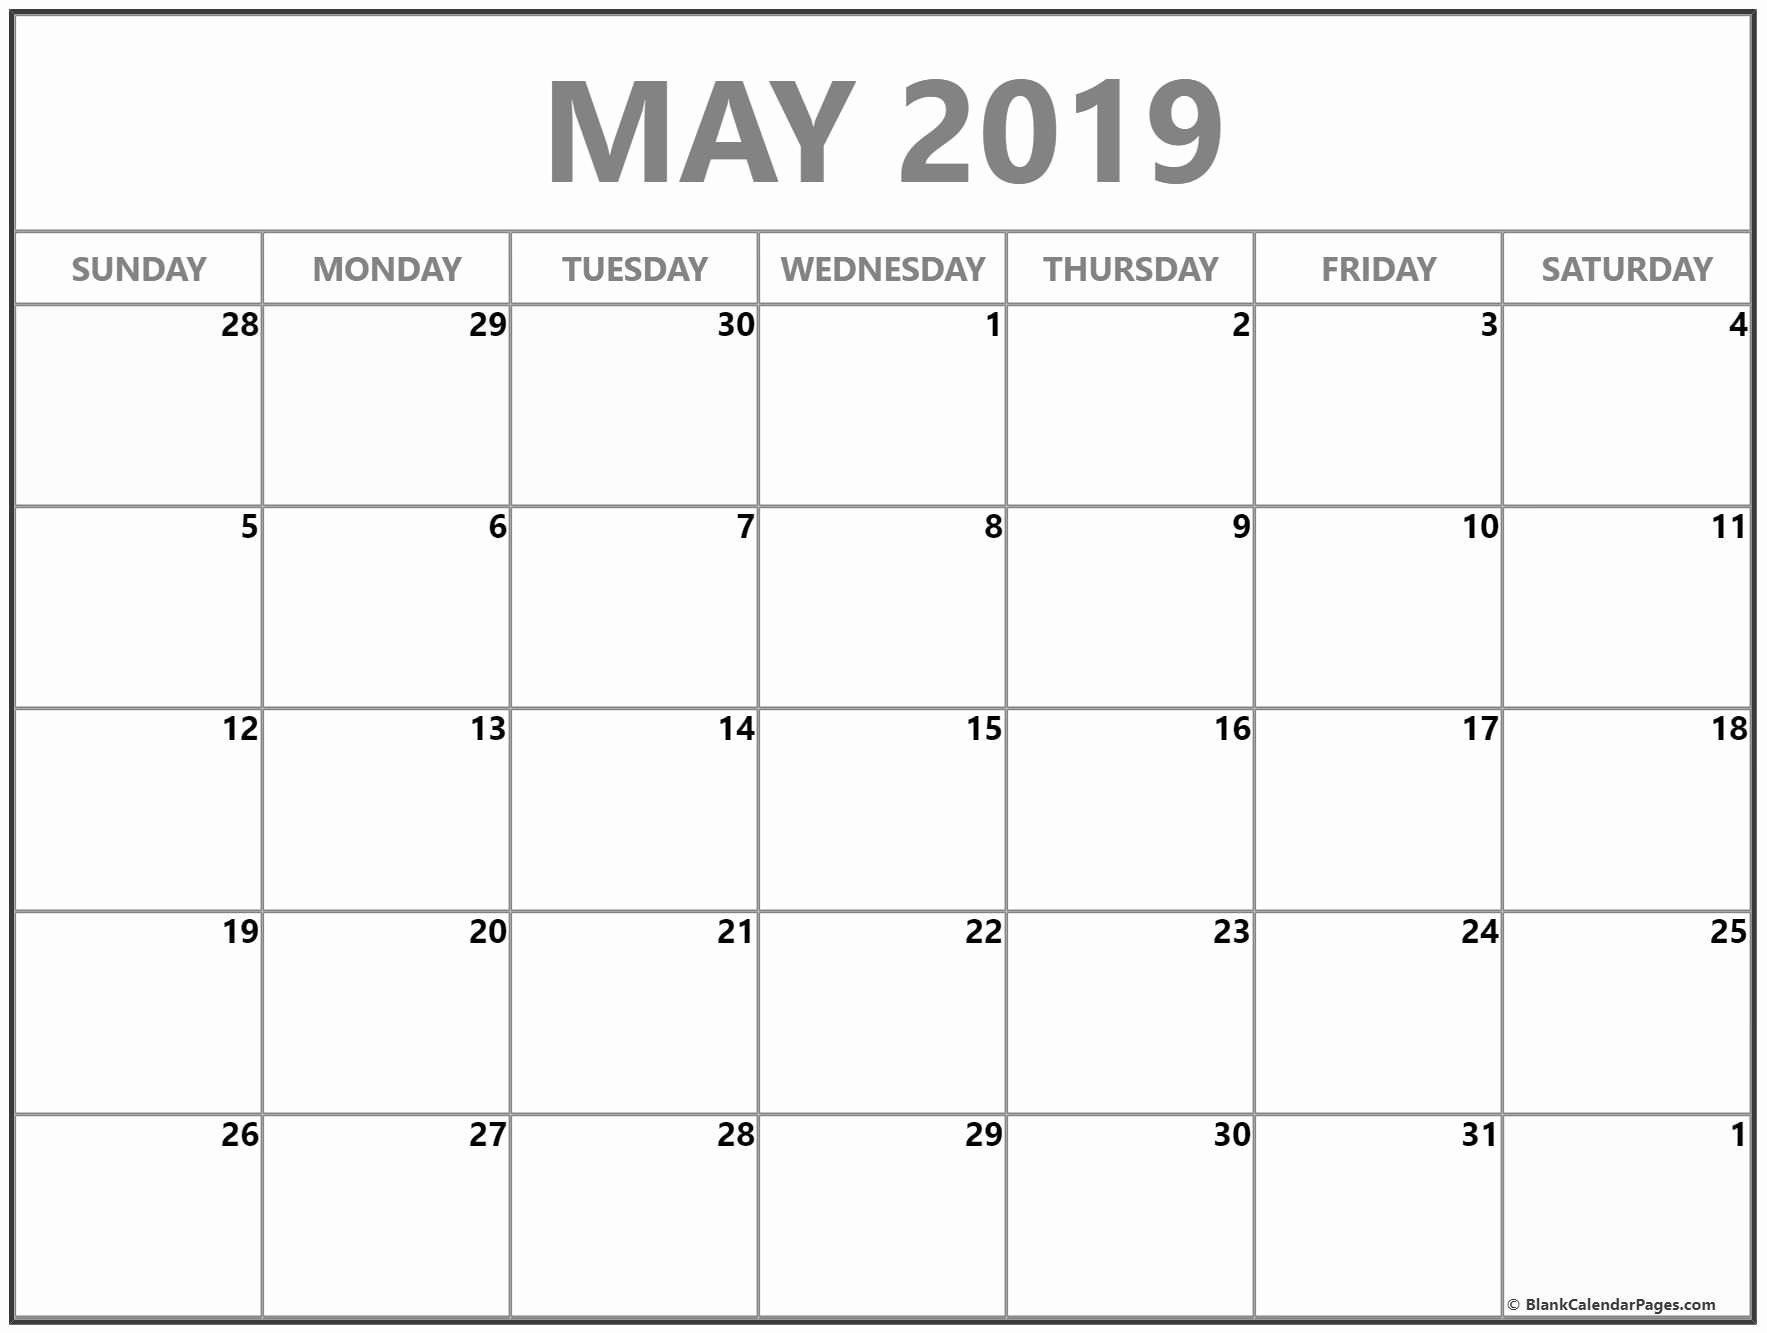 Monthly Blank Calendar May 2019 | Monthly Calendar Template-Calendar Templates By Vertex